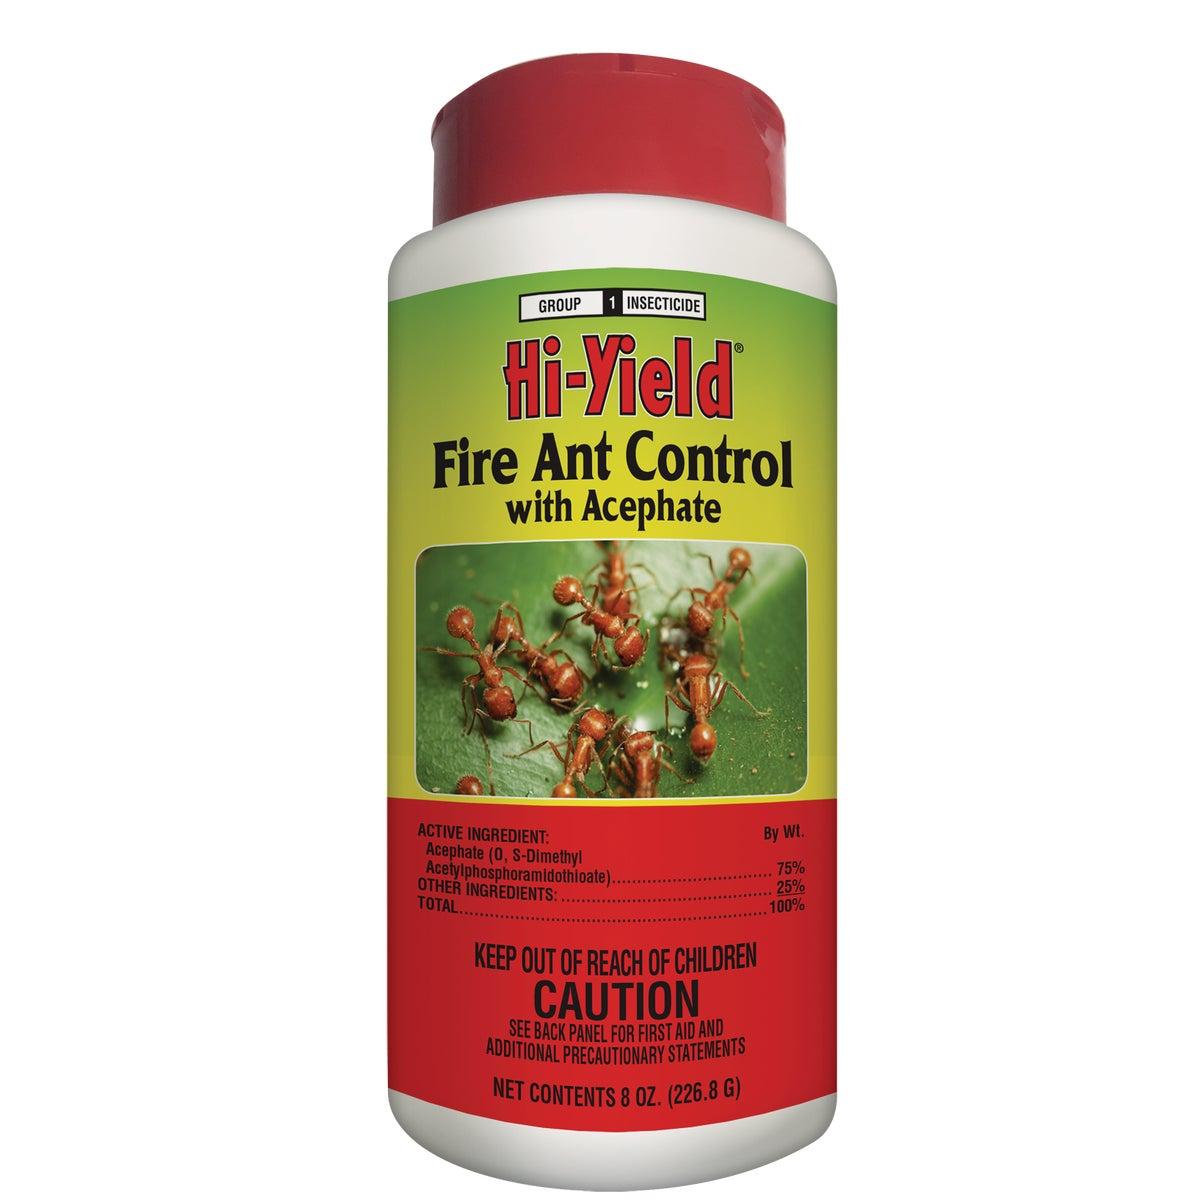 8OZ FIRE ANT CONTROL